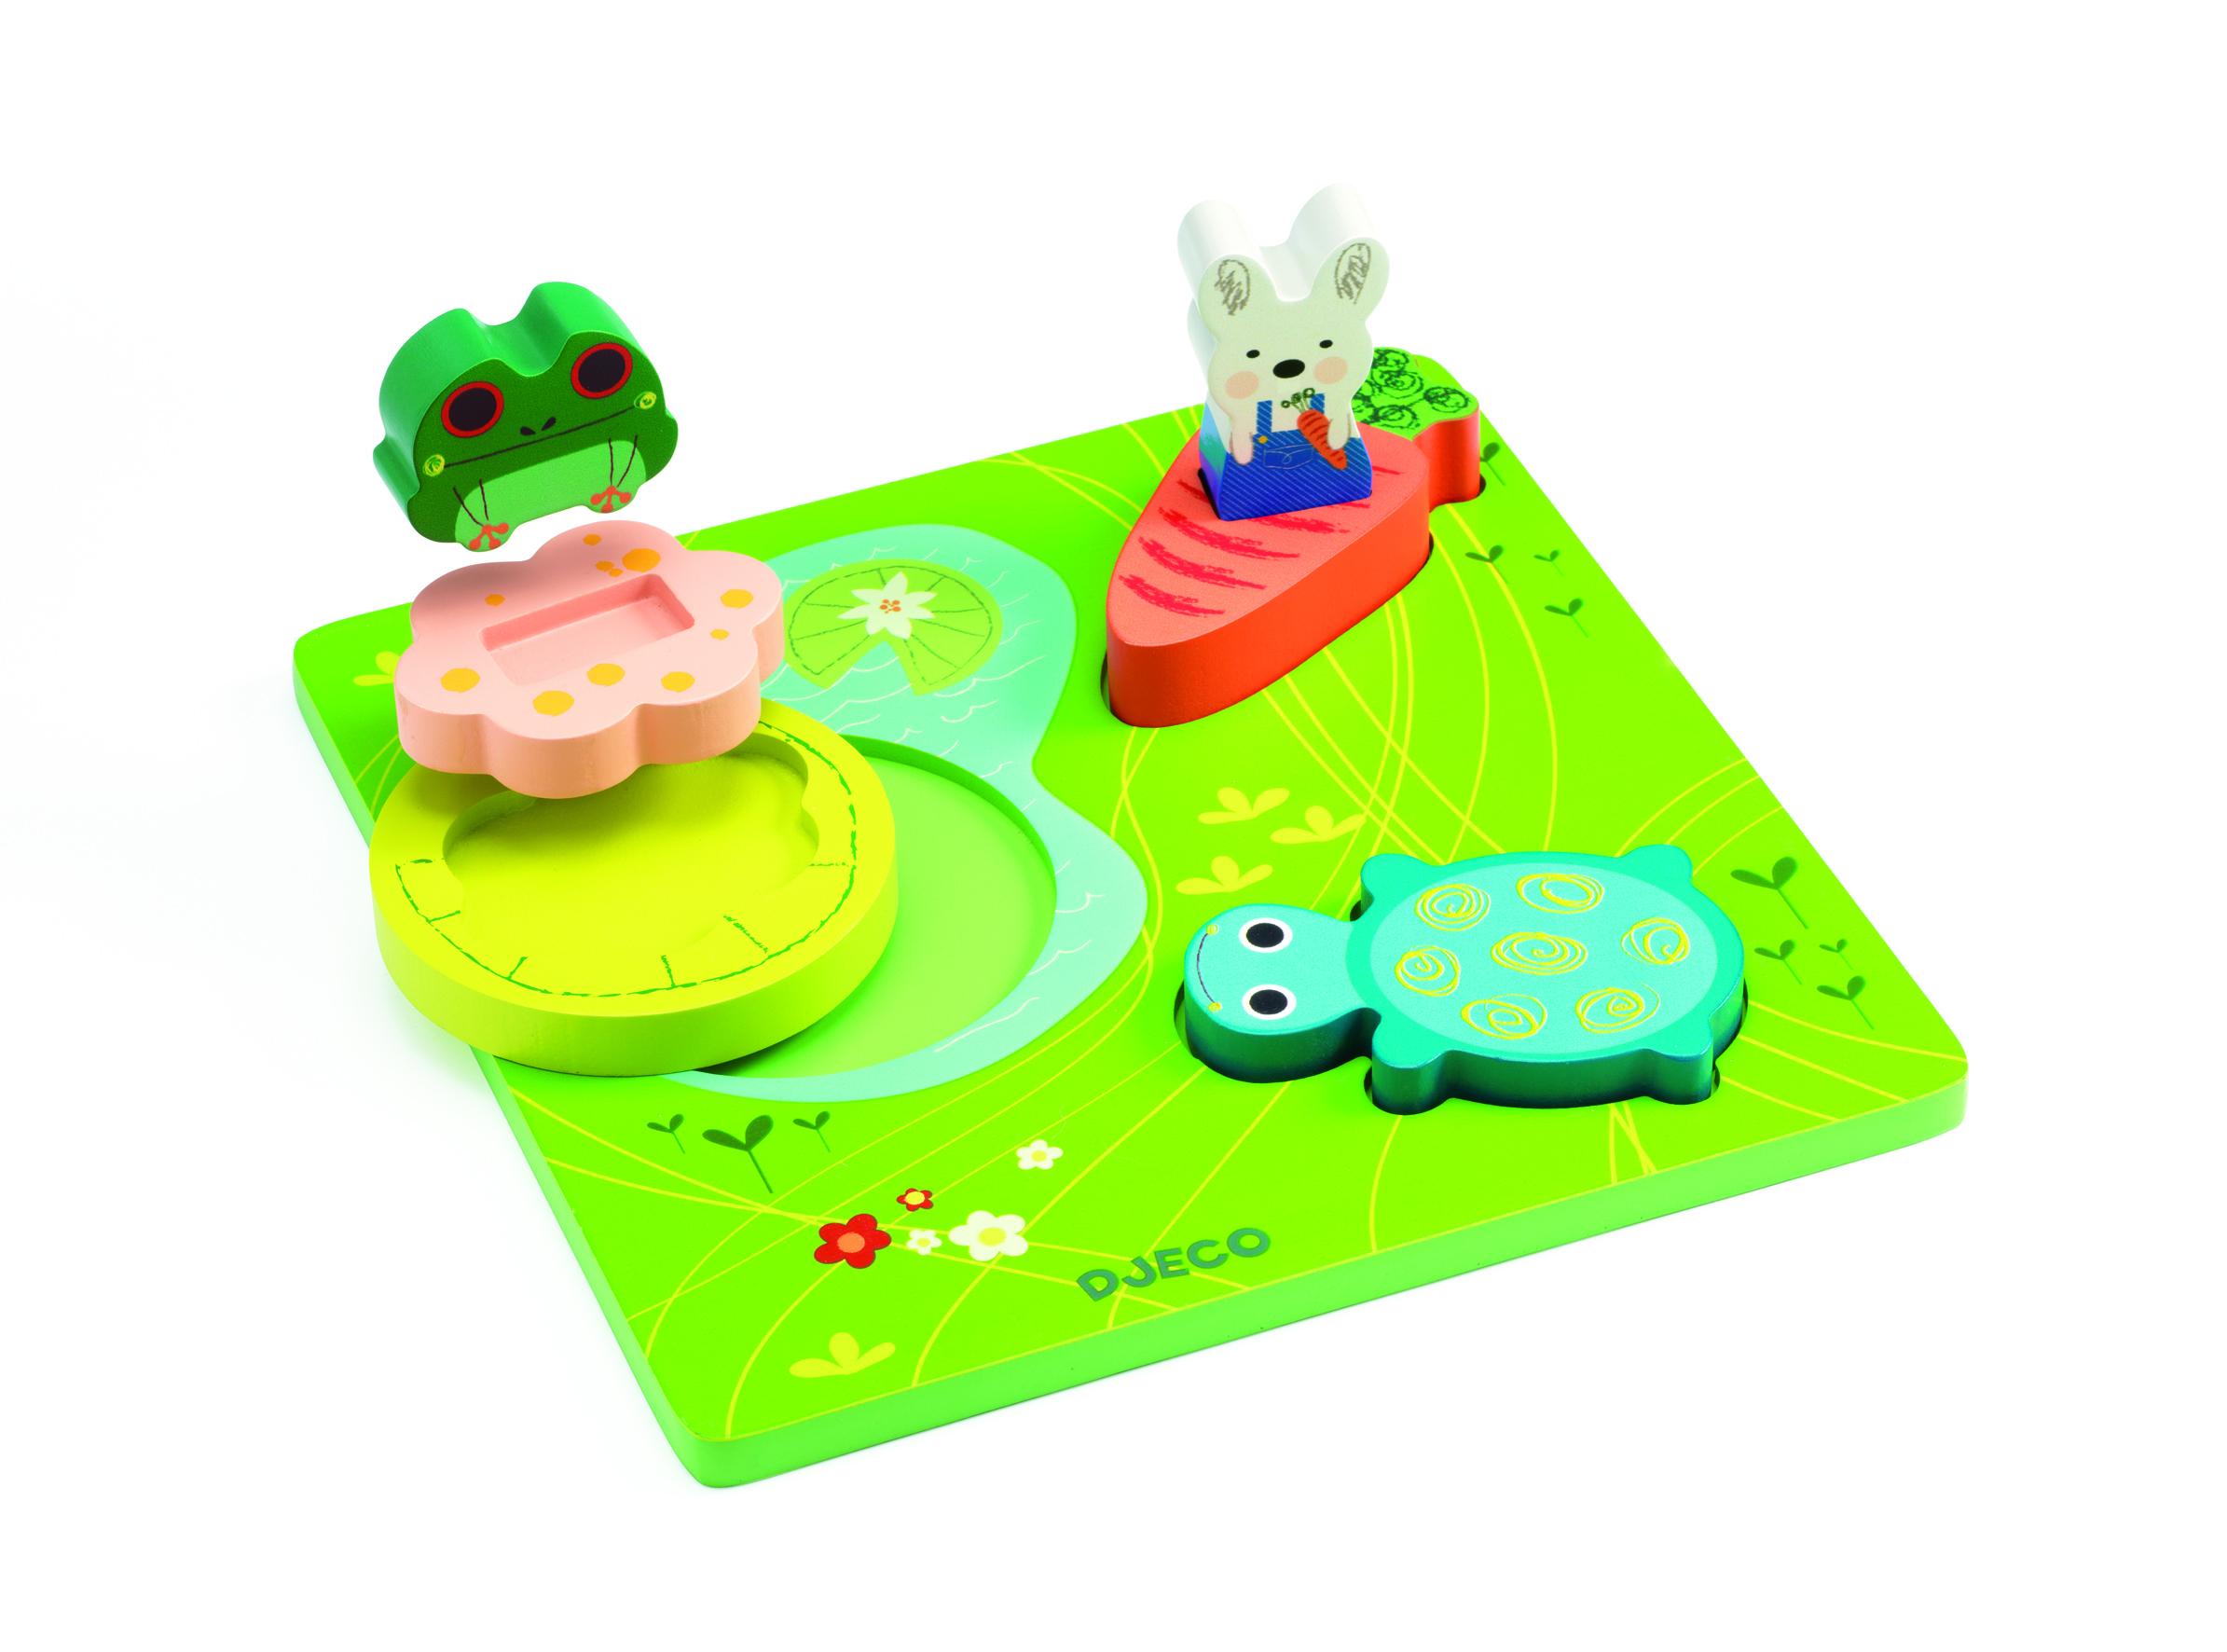 Puzzle lemn relief 1 2 3 froggy djeco imagine